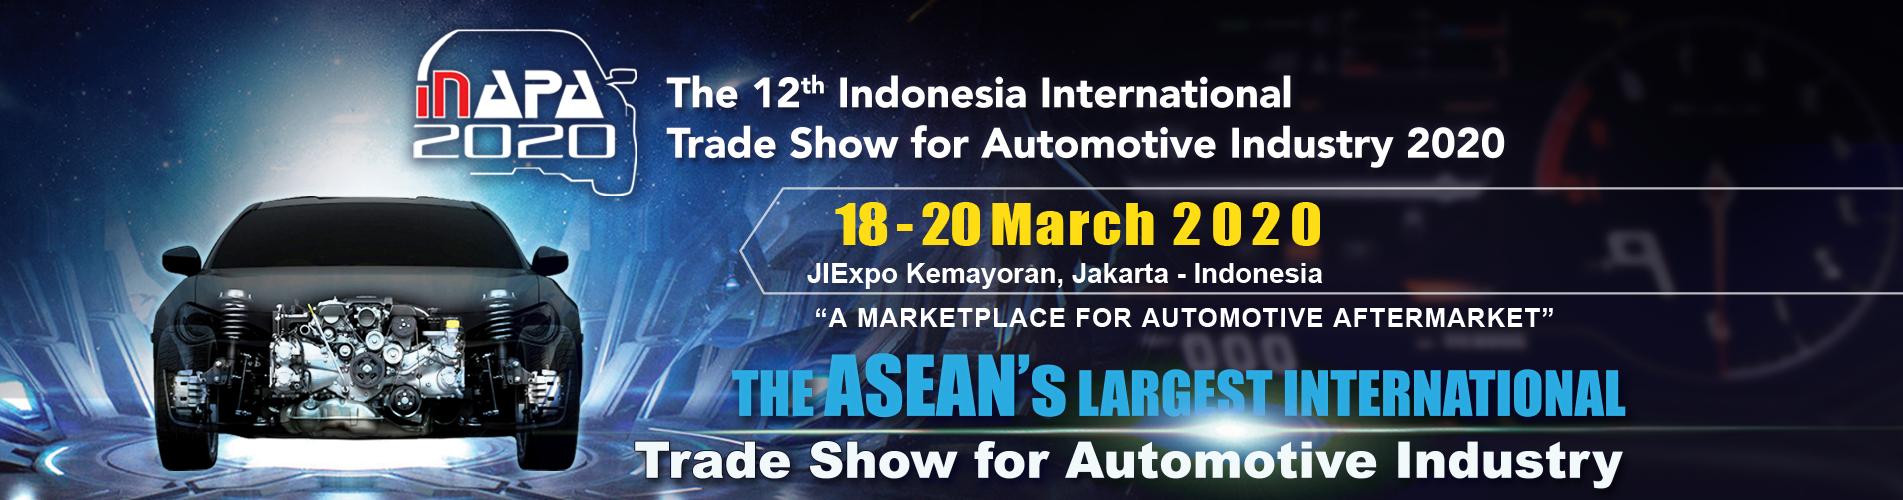 Exhibitor List Inapa Exhibition Indonesia